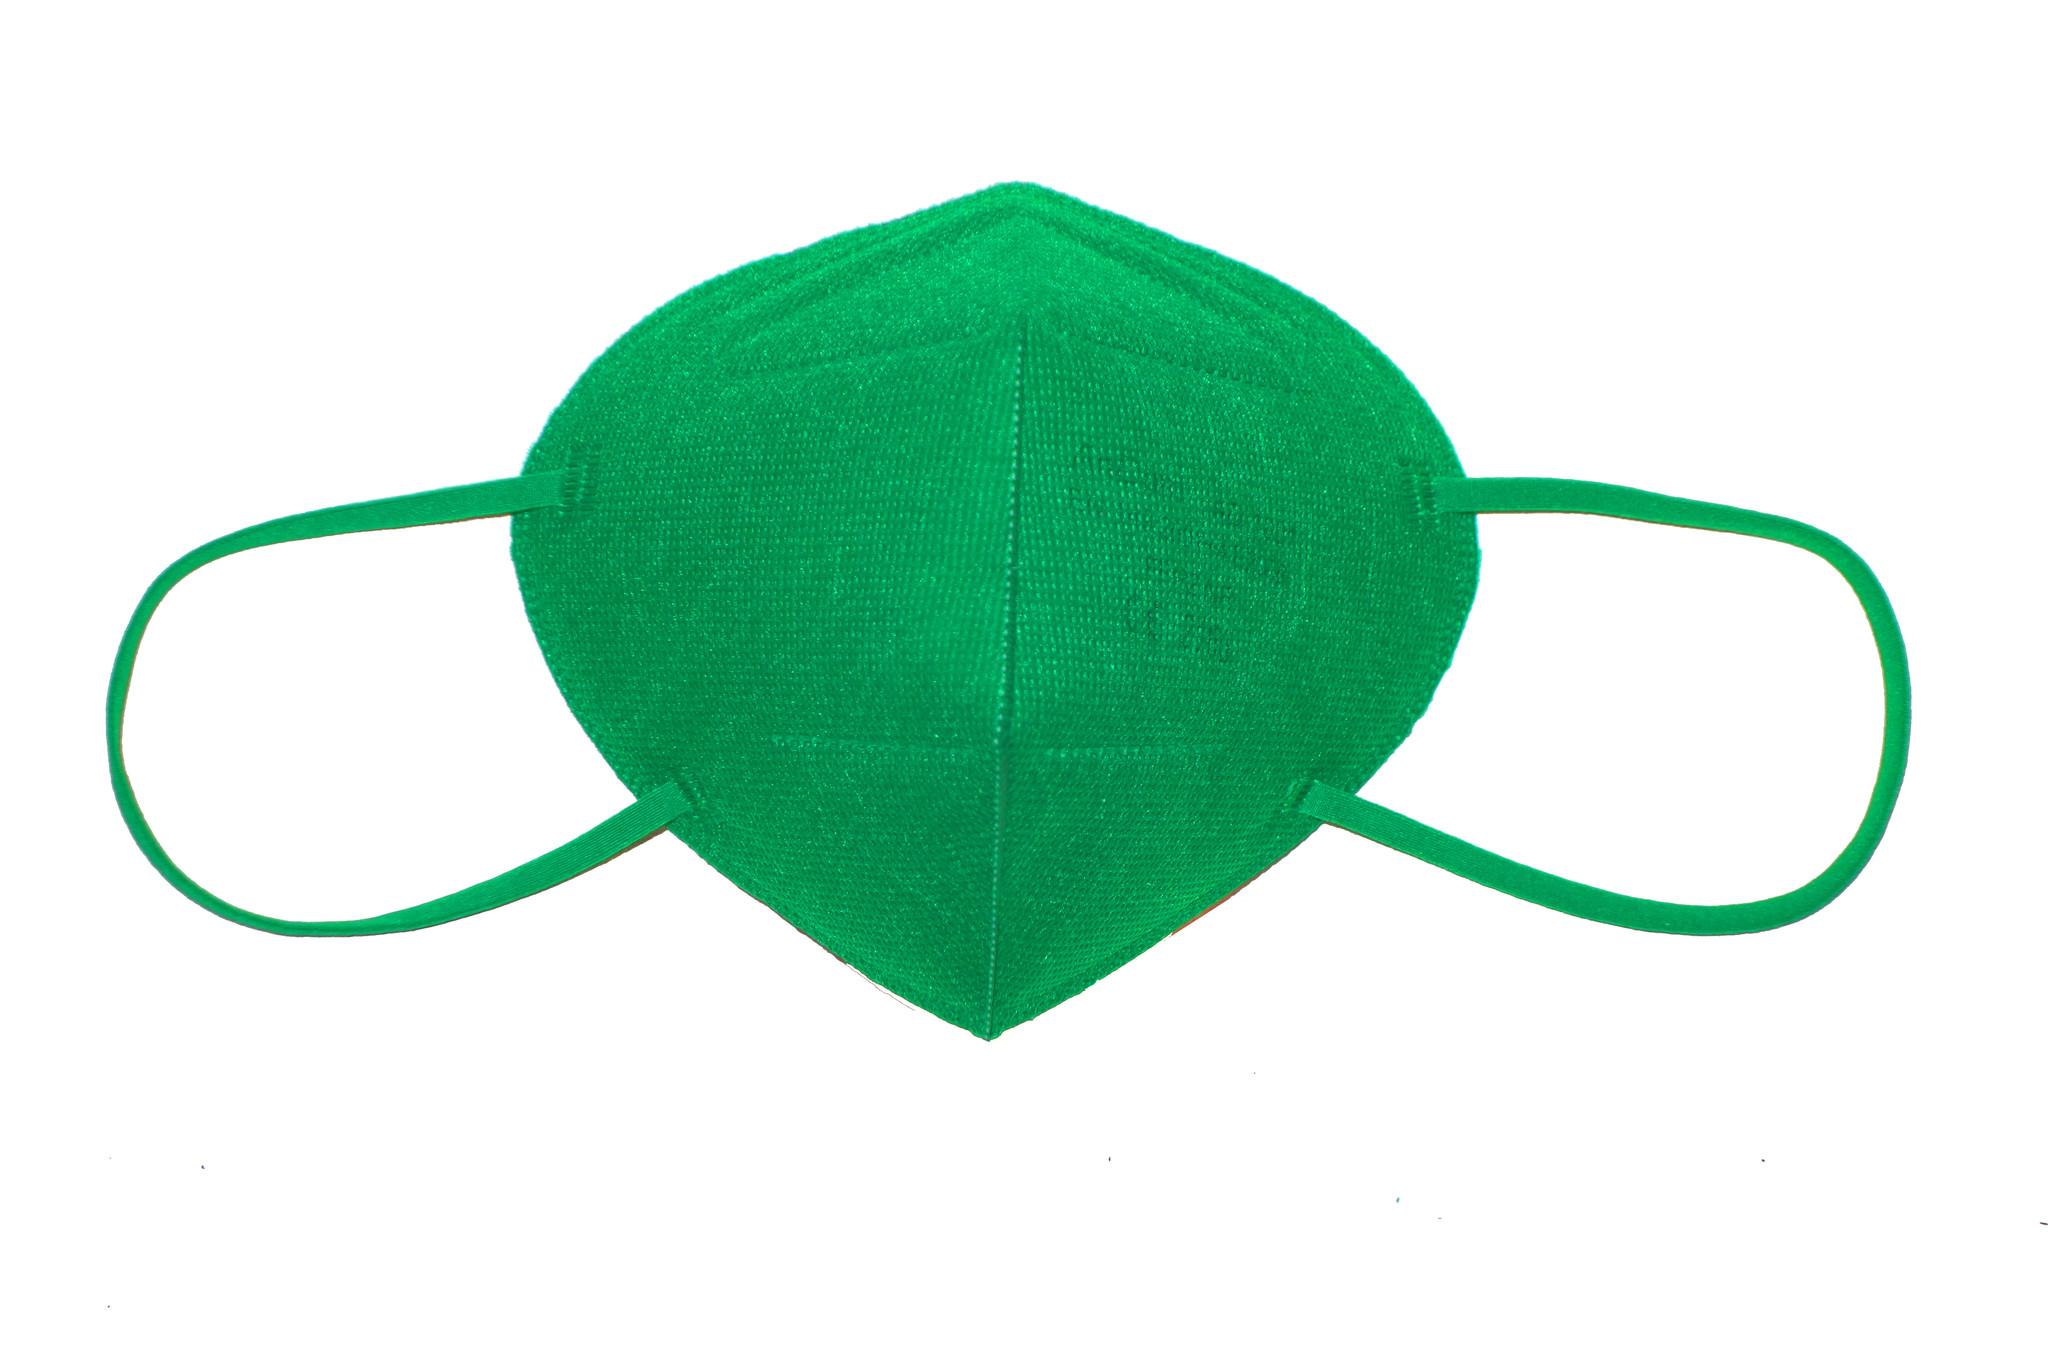 CE zertifizierte bunte FFP2 Maske dunkelgrün / grasgrün schon ab 0,75 € B2B